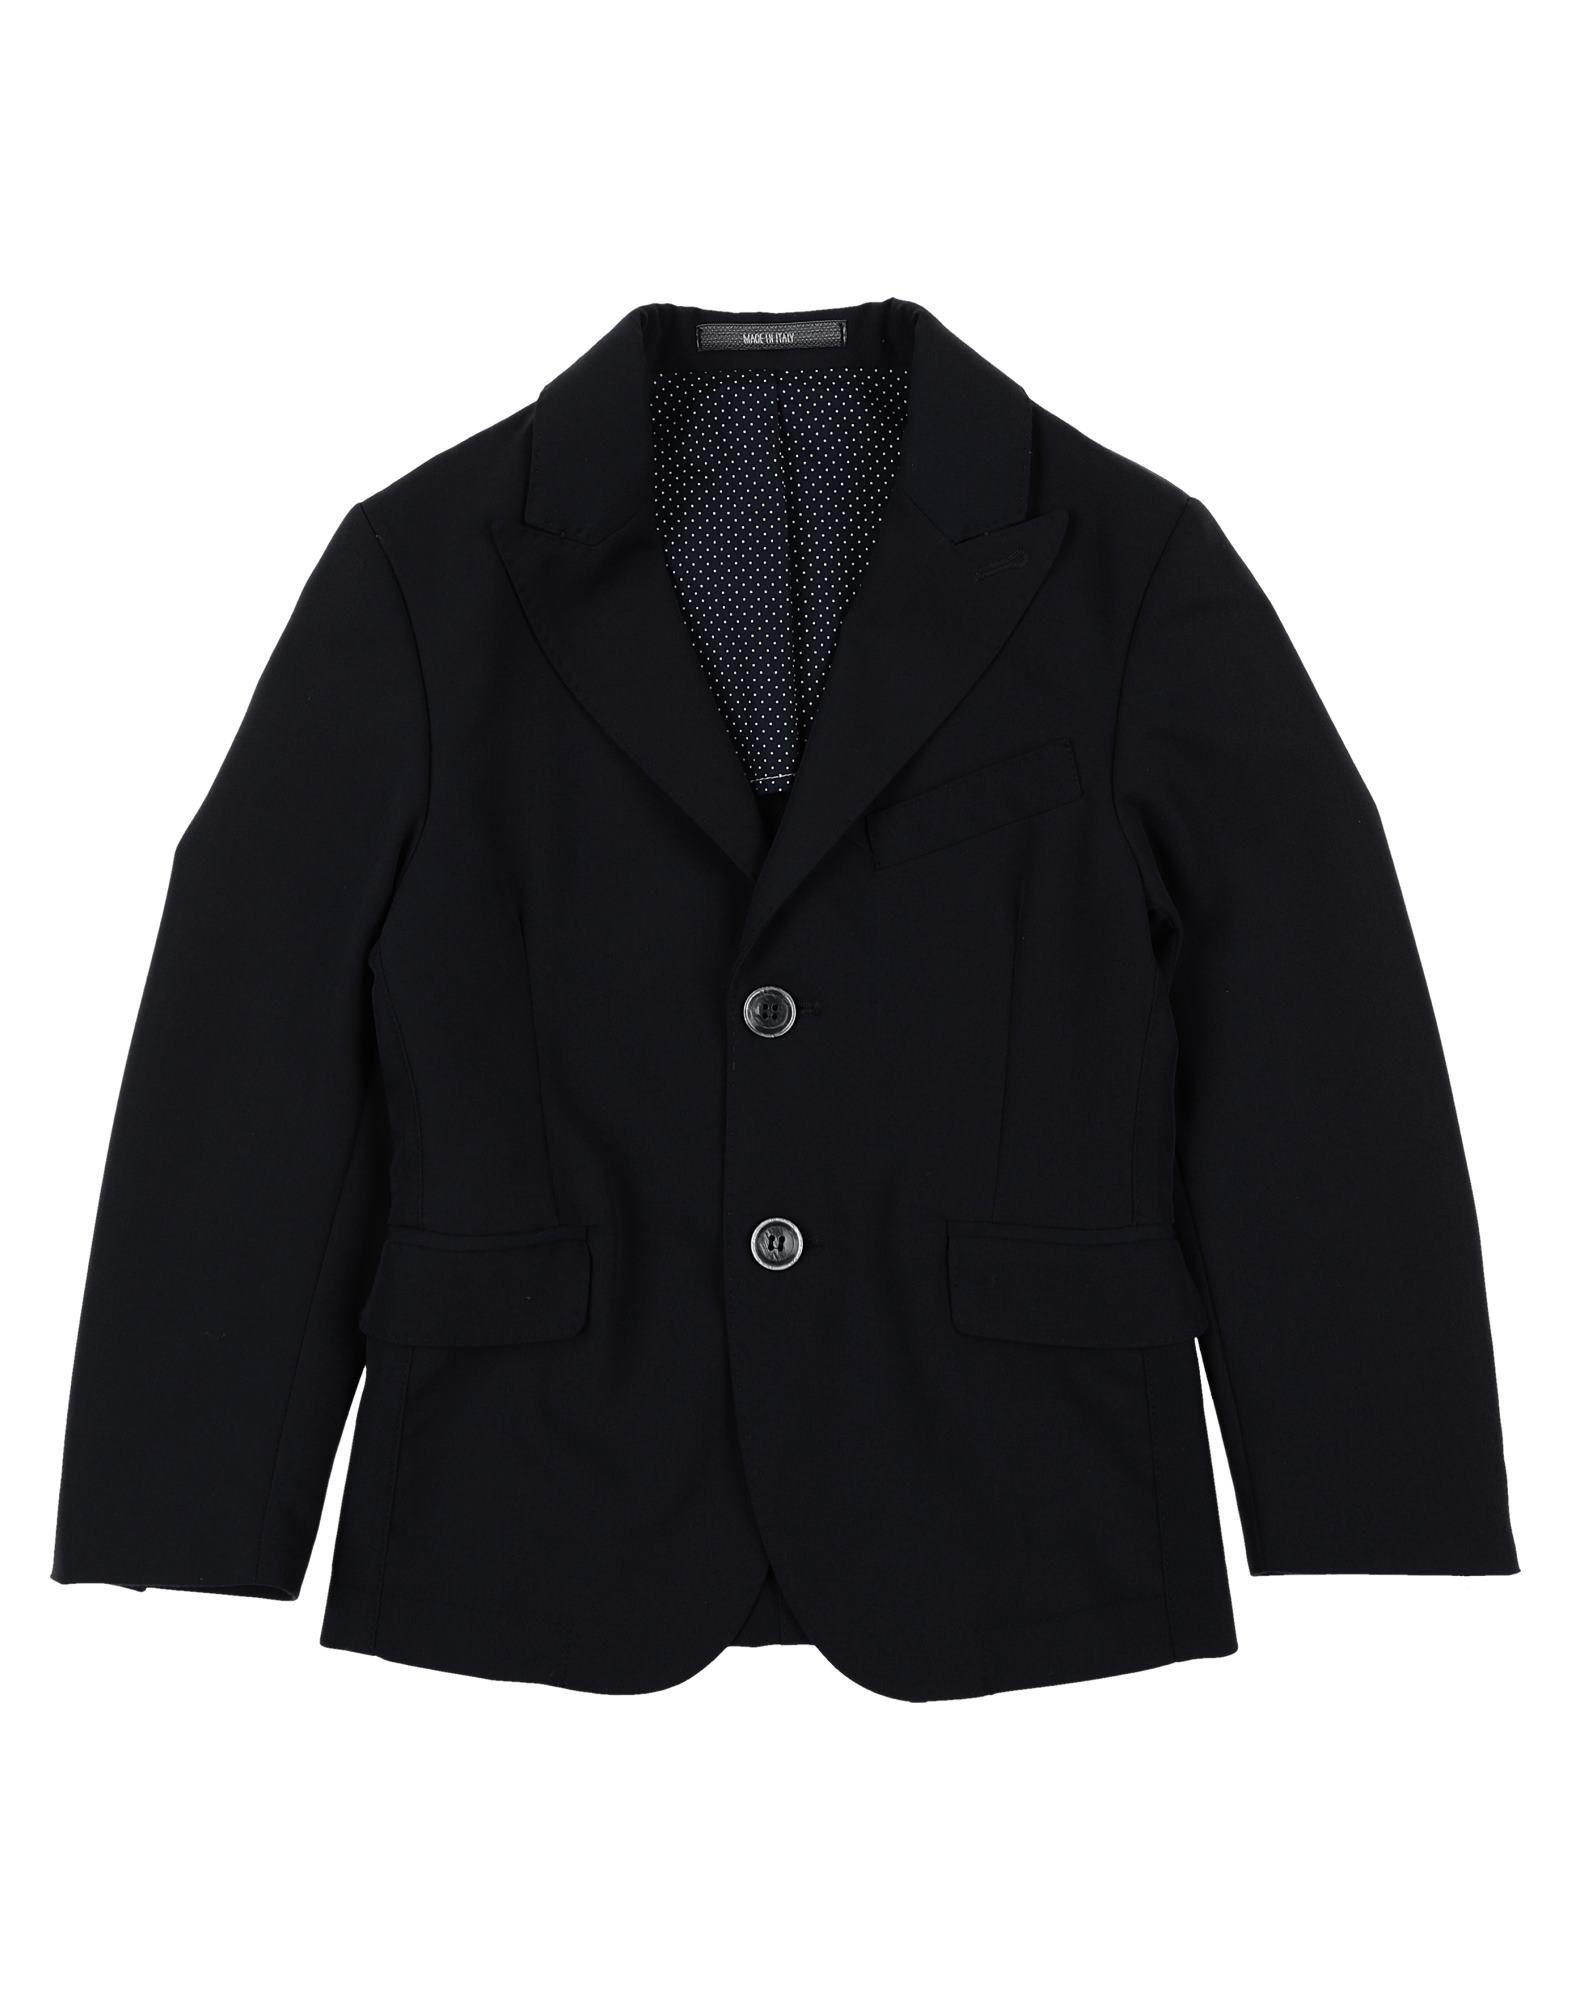 26.7 Twentysixseven Kids' Suit Jackets In Dark Blue